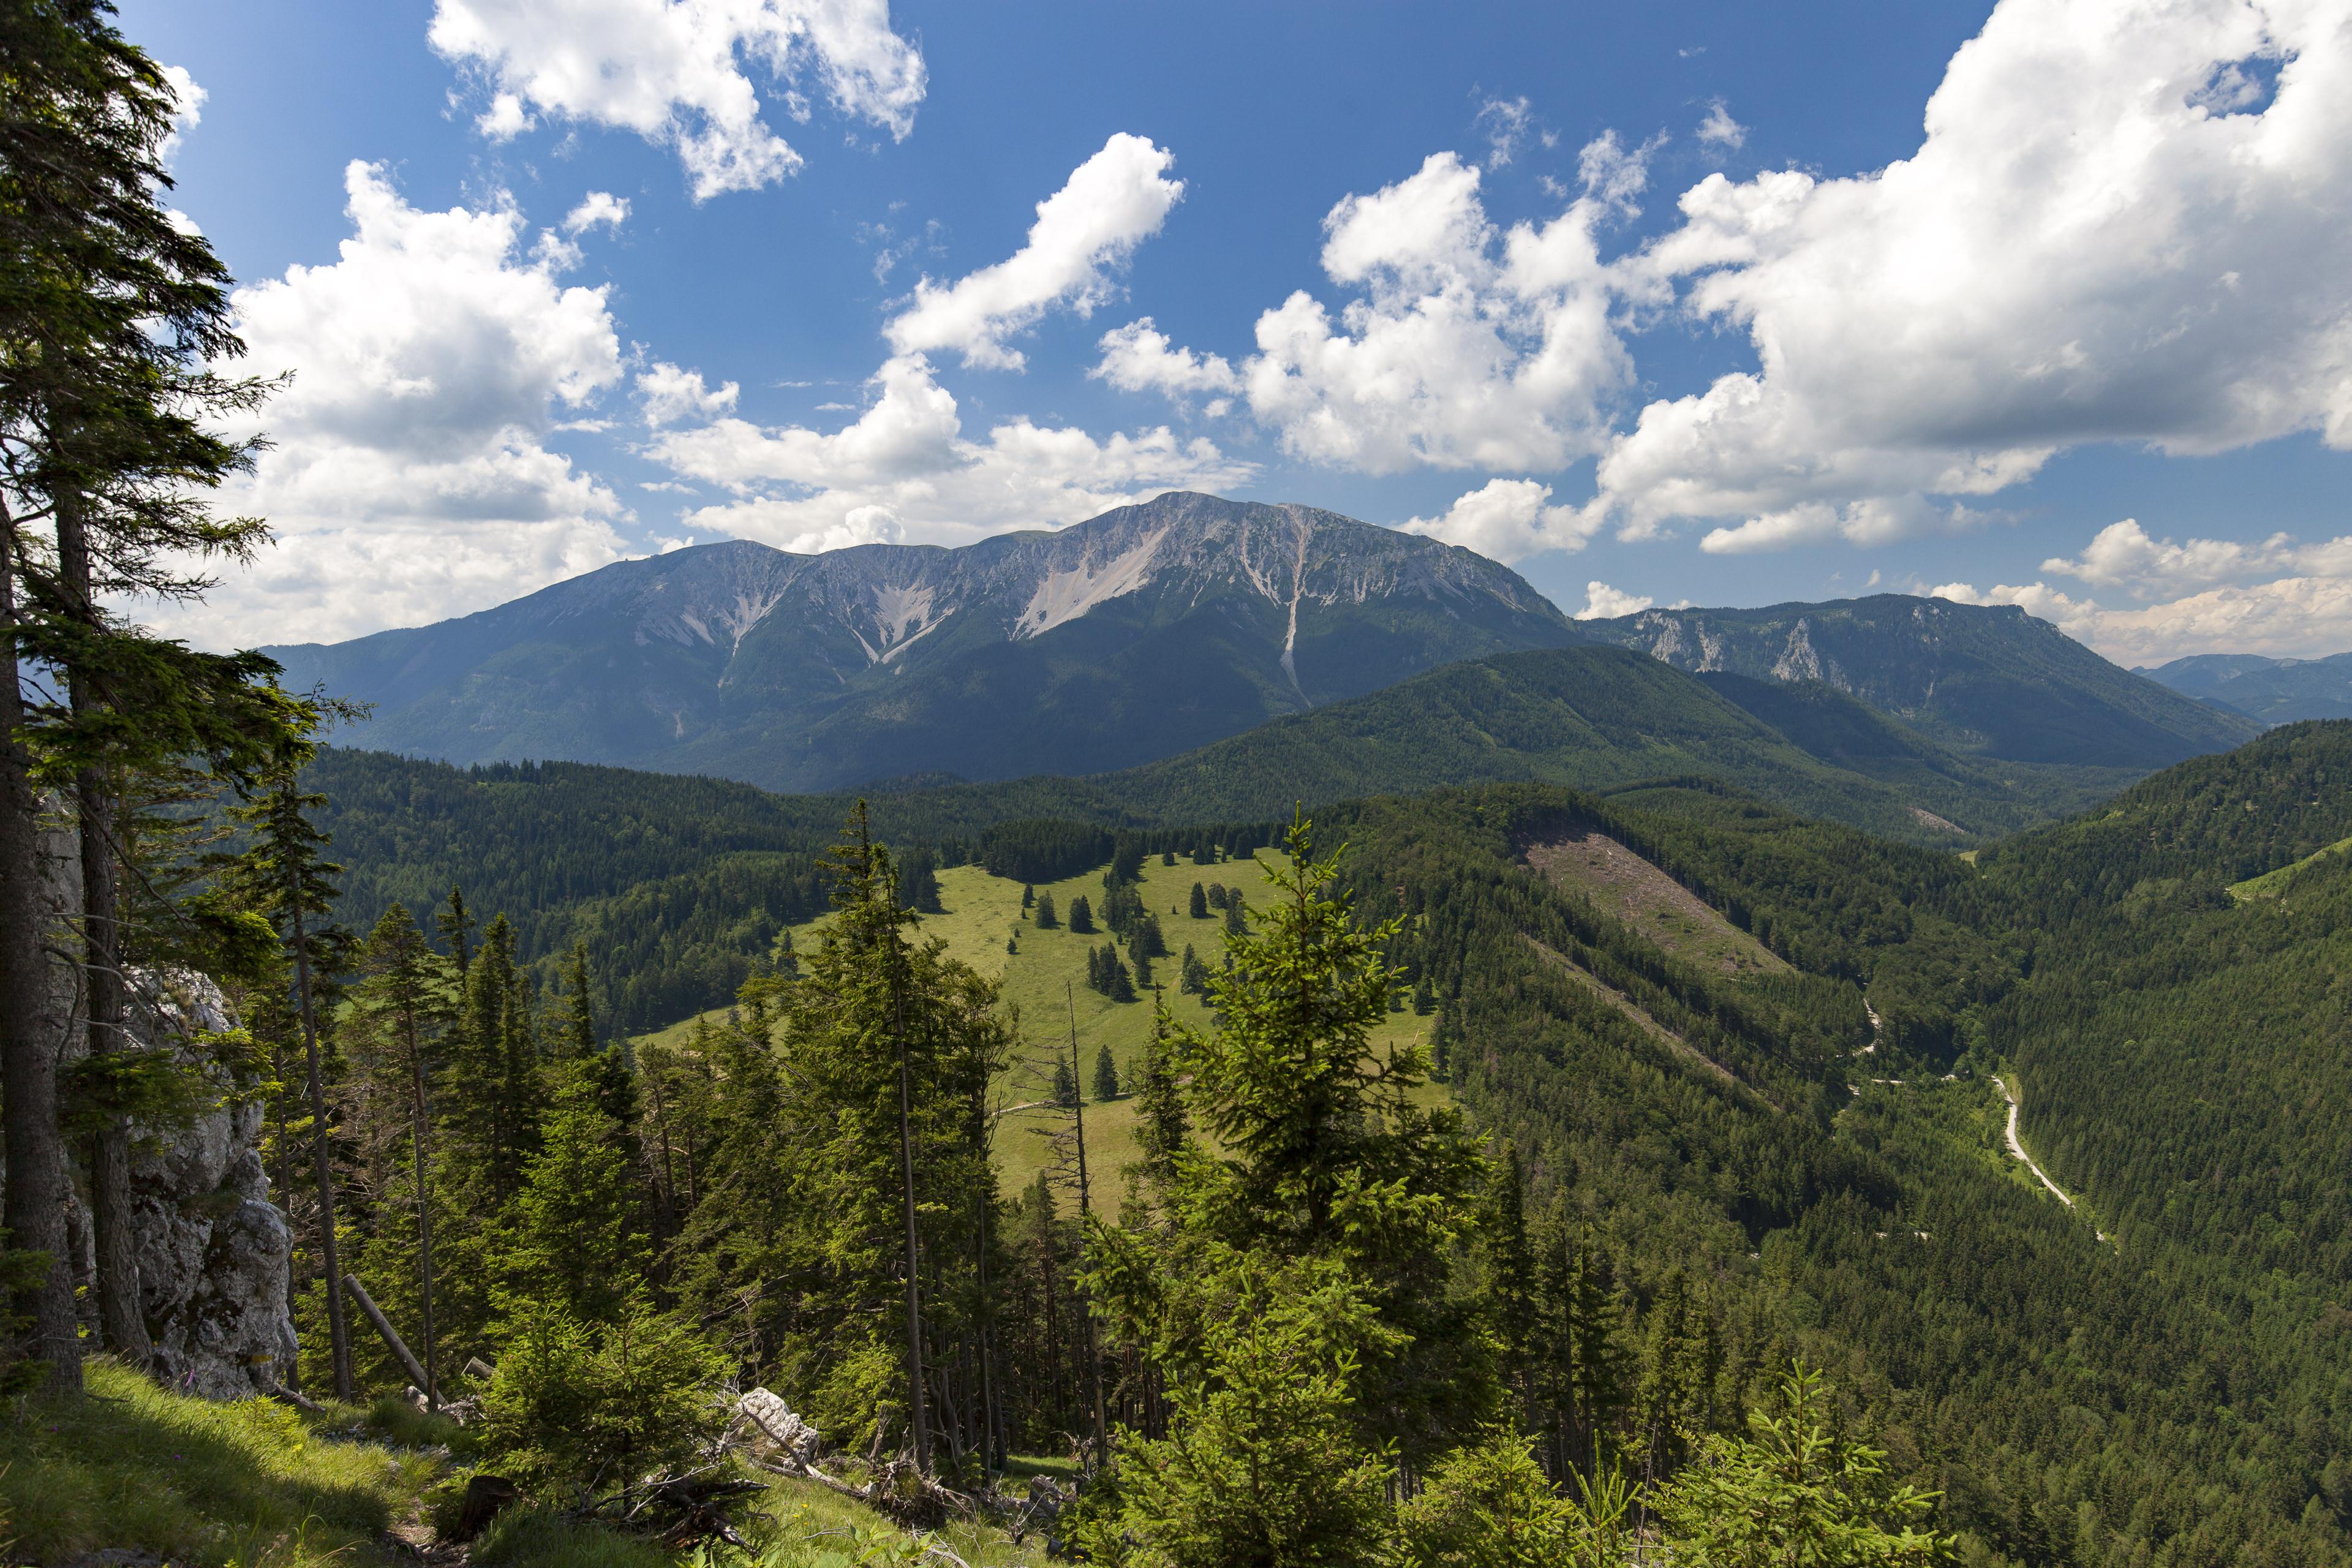 Blick vom Schober zum Schneeberg,©Markus Proske—Canon EOS 5D Mark II, EF16-35mm f/4L IS USM, 20mm, 1/200s, Blende 6.3, ISO 100